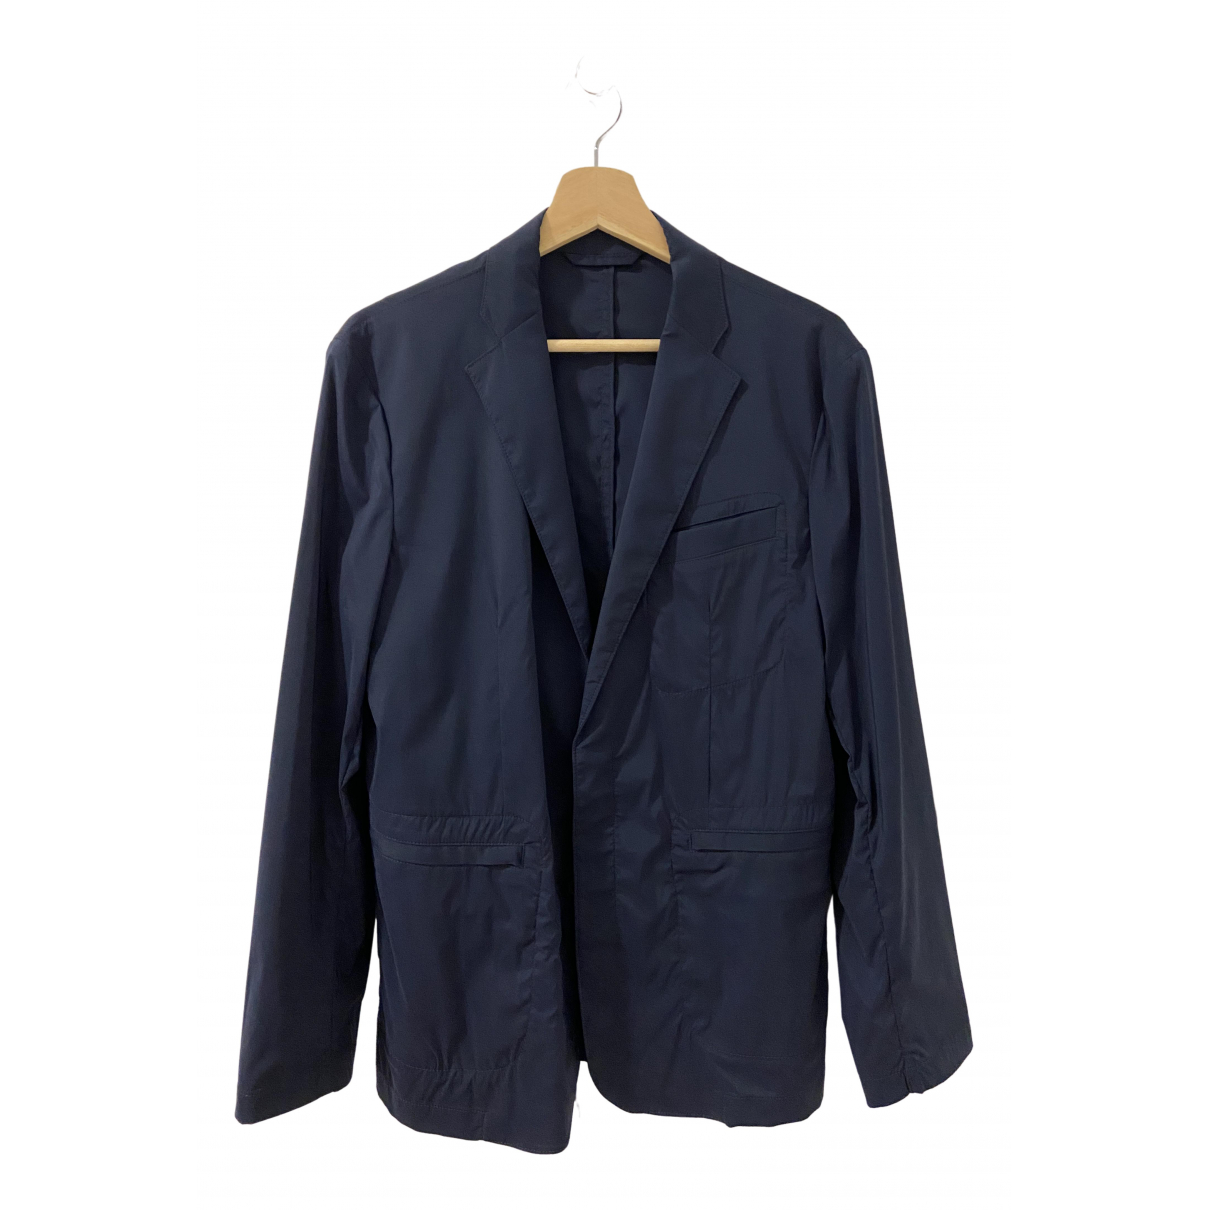 Acne Studios \N Navy jacket  for Men 46 FR